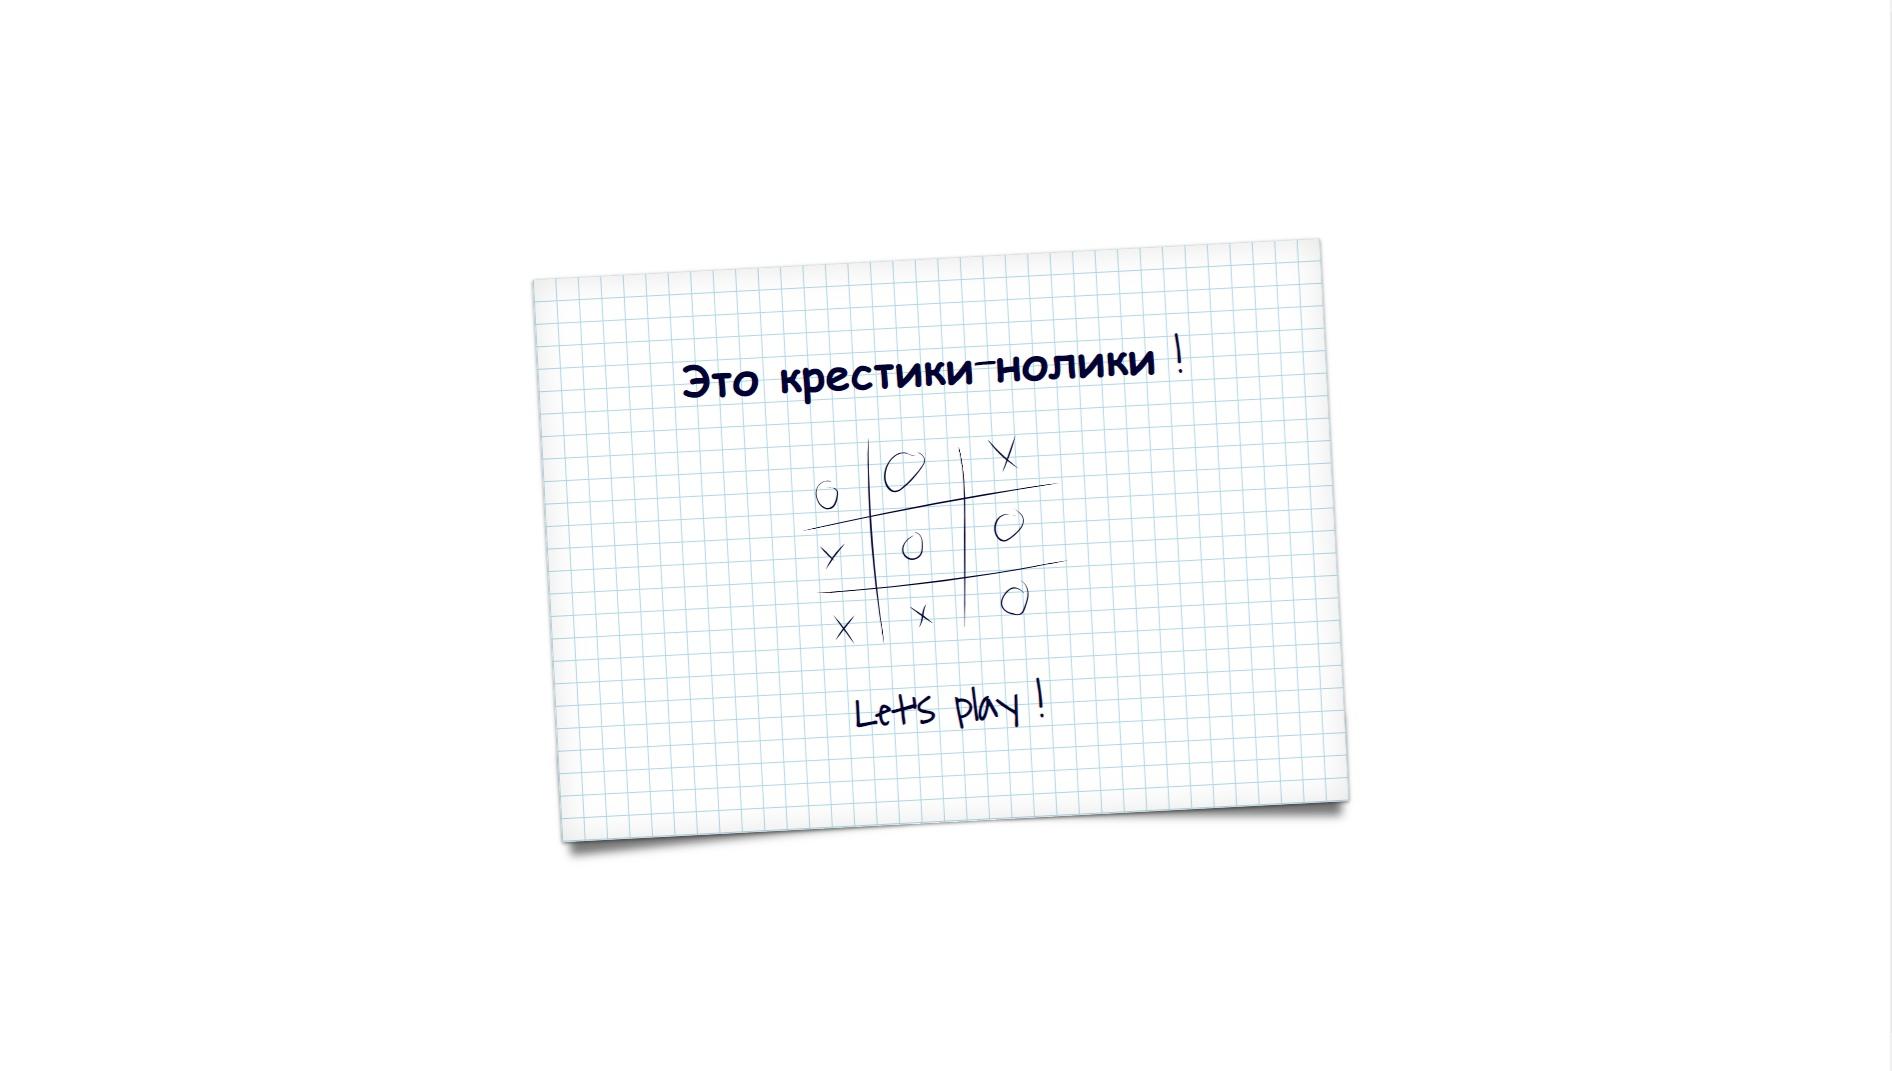 Крестики-нолики - Tic Tac Toe для Android